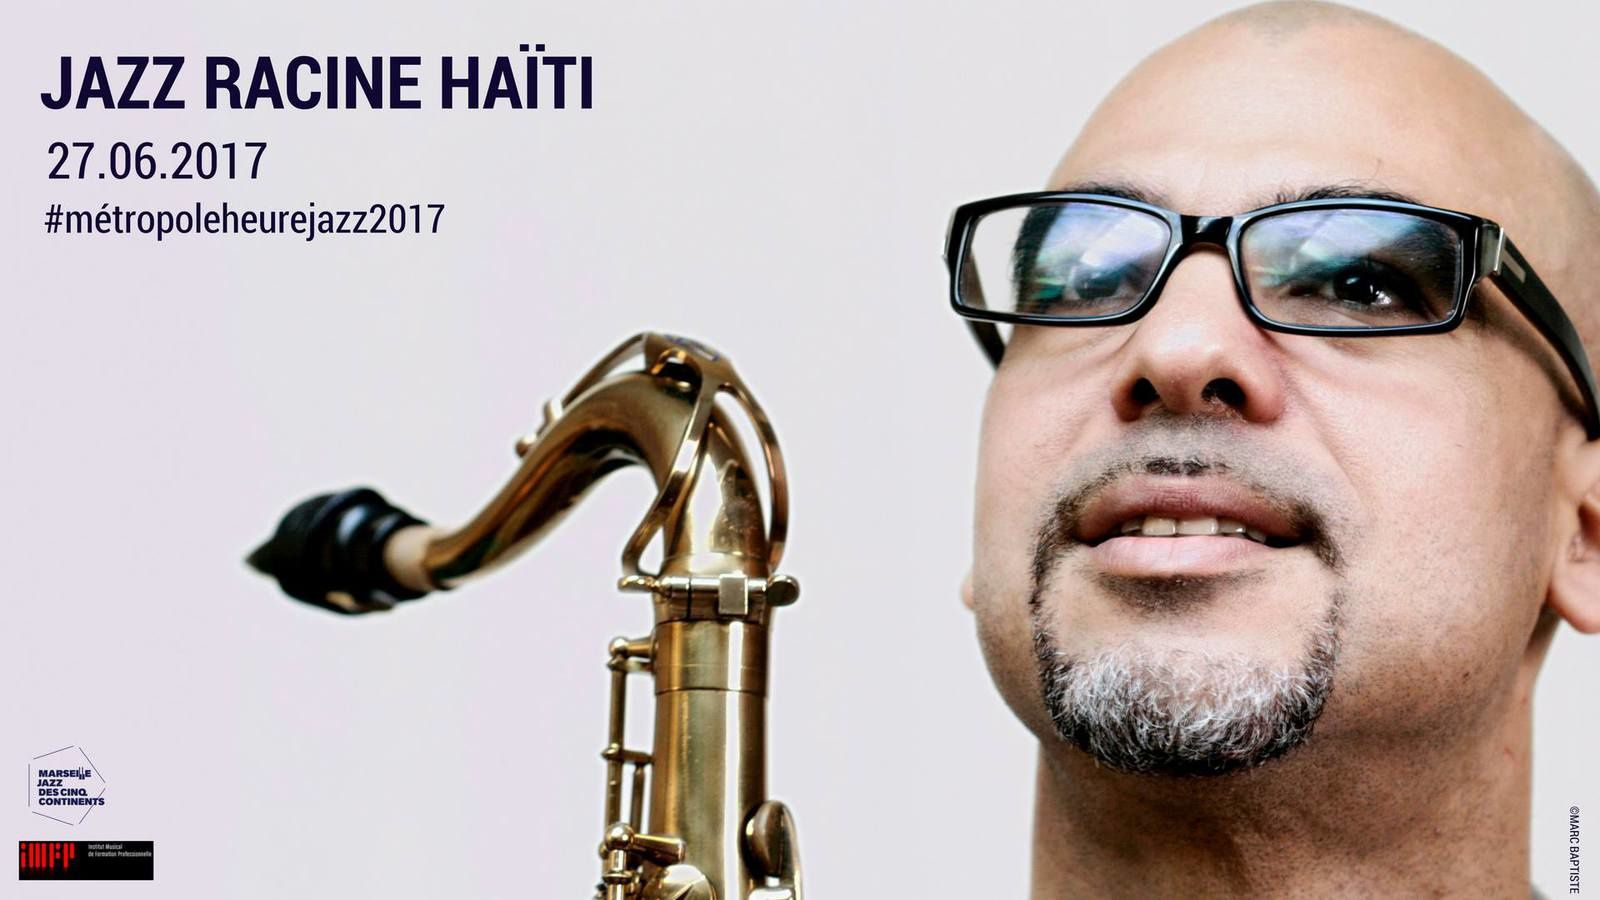 27/06/17 - JAZZ RACINE HAÏTI - Salon de Provence